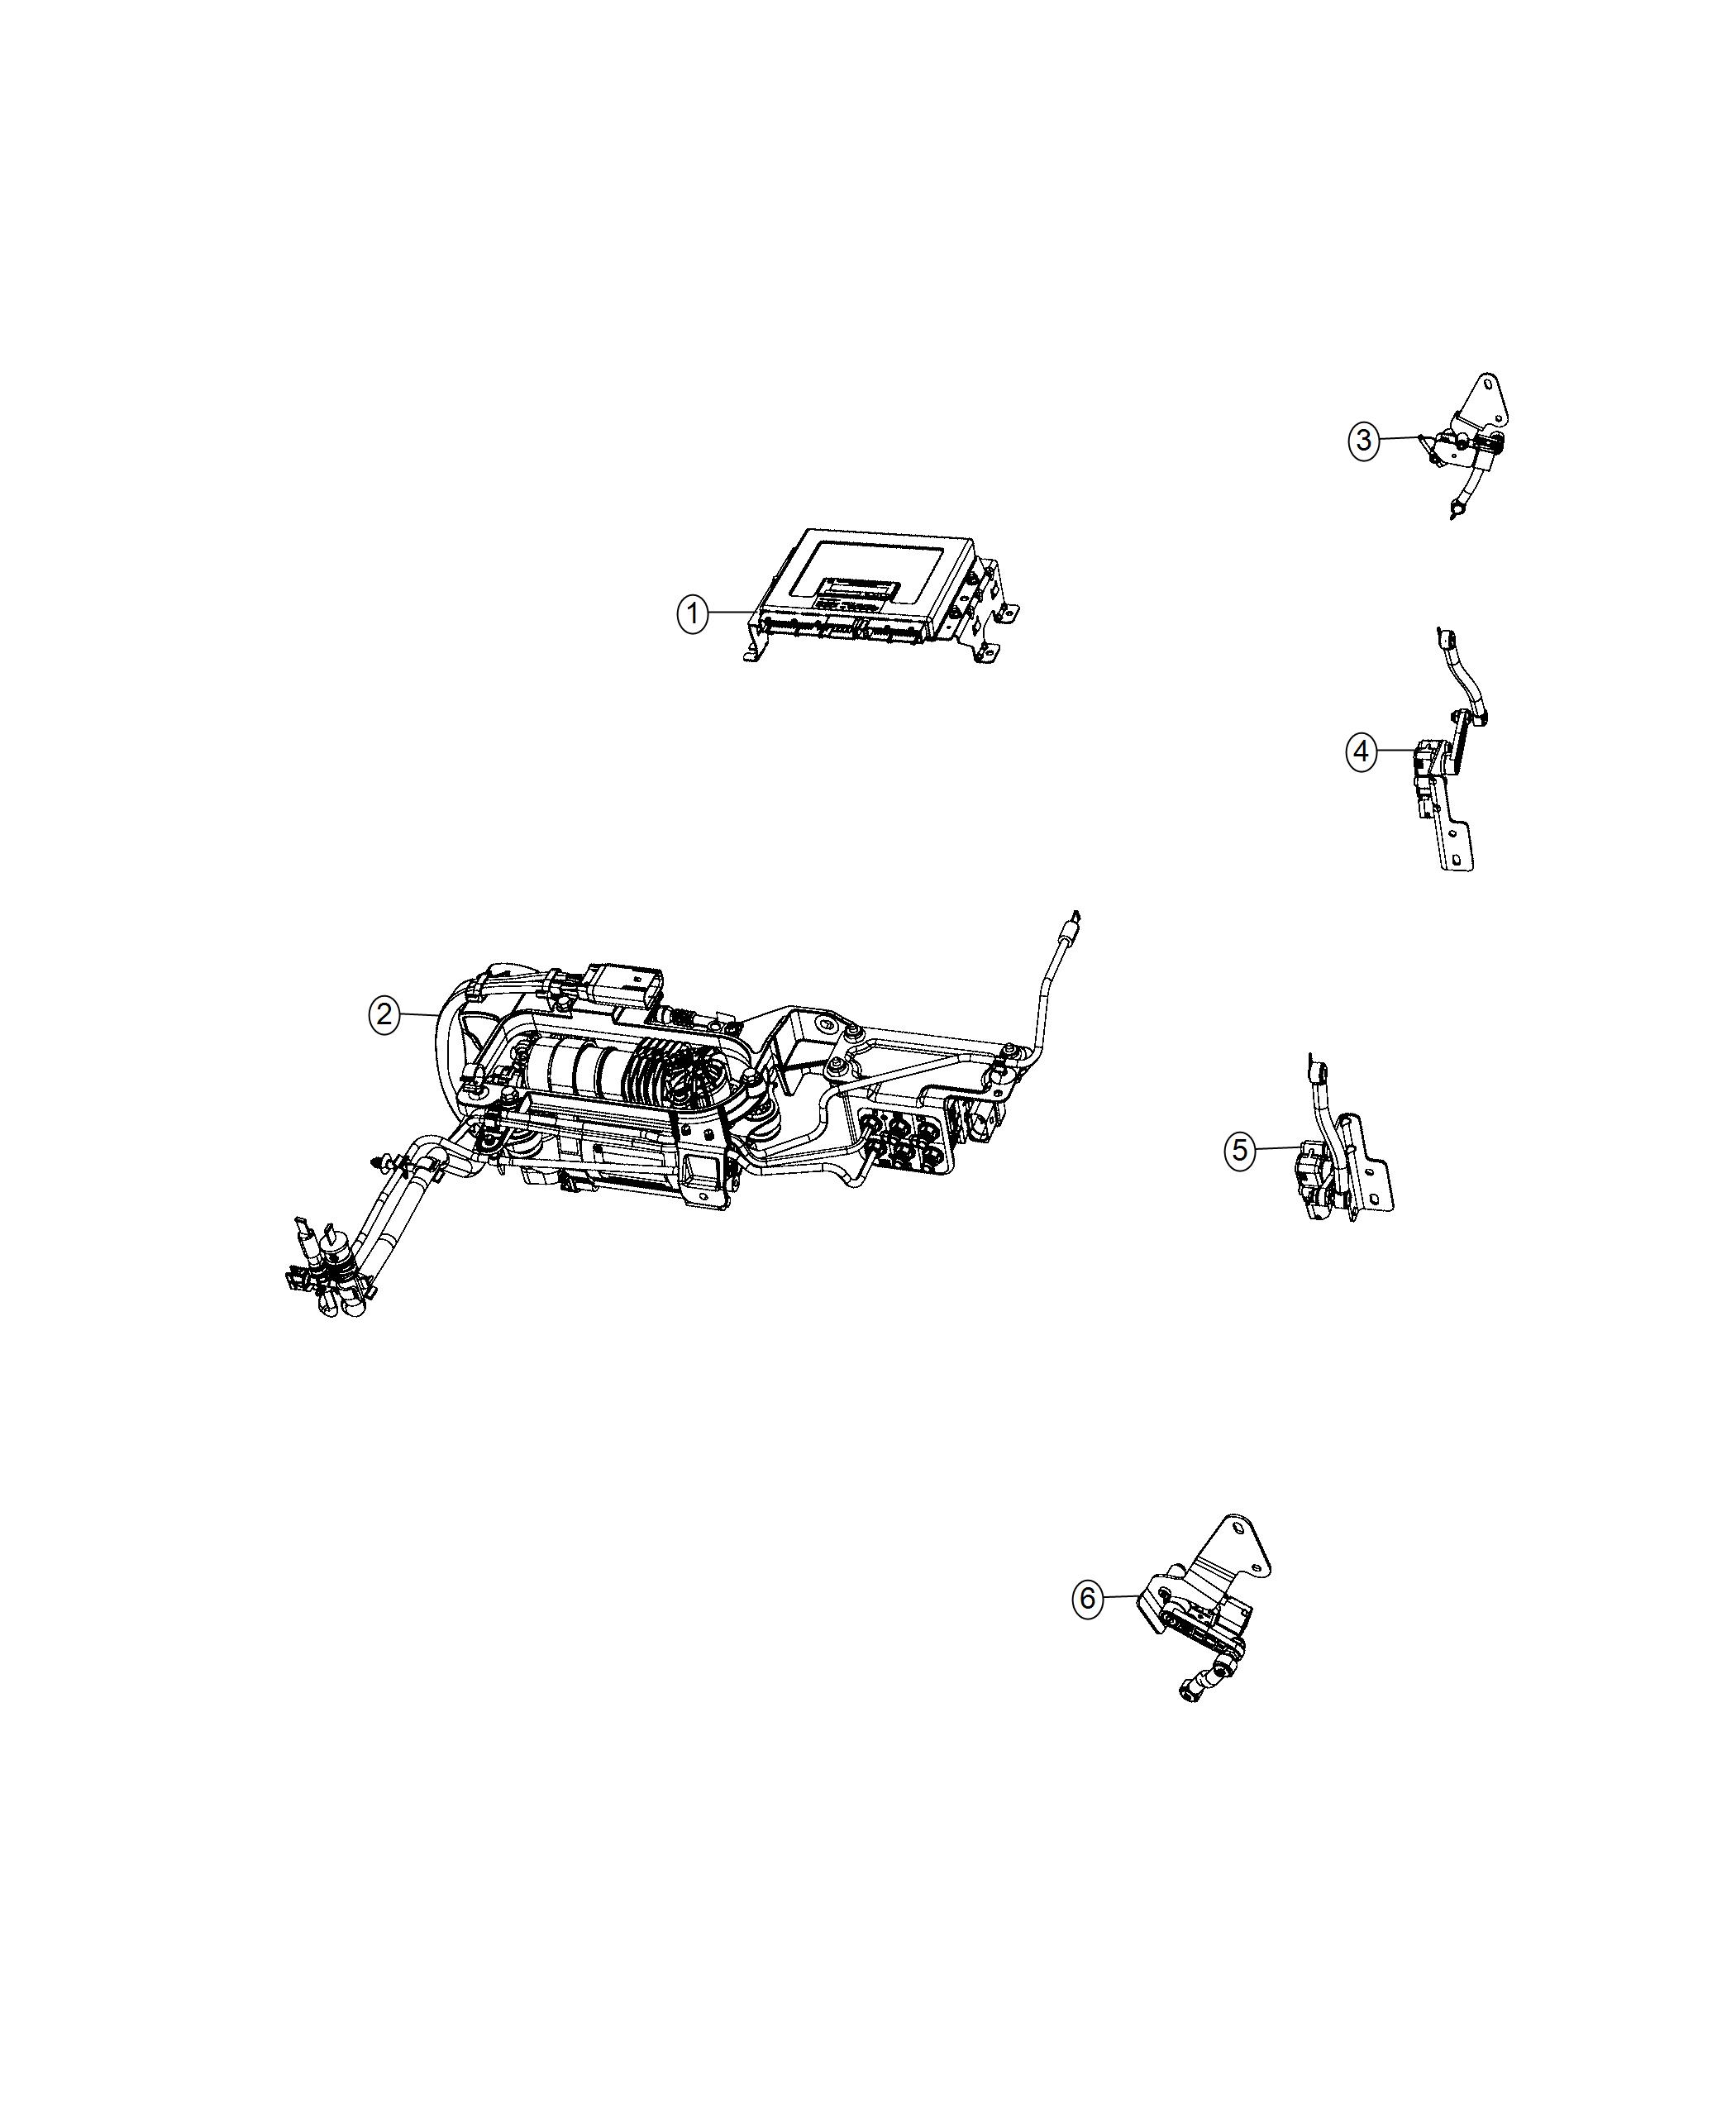 Air Ride Suspension Diagram - Wiring Diagrams Folder Northstar Camper Wiring Diagram on